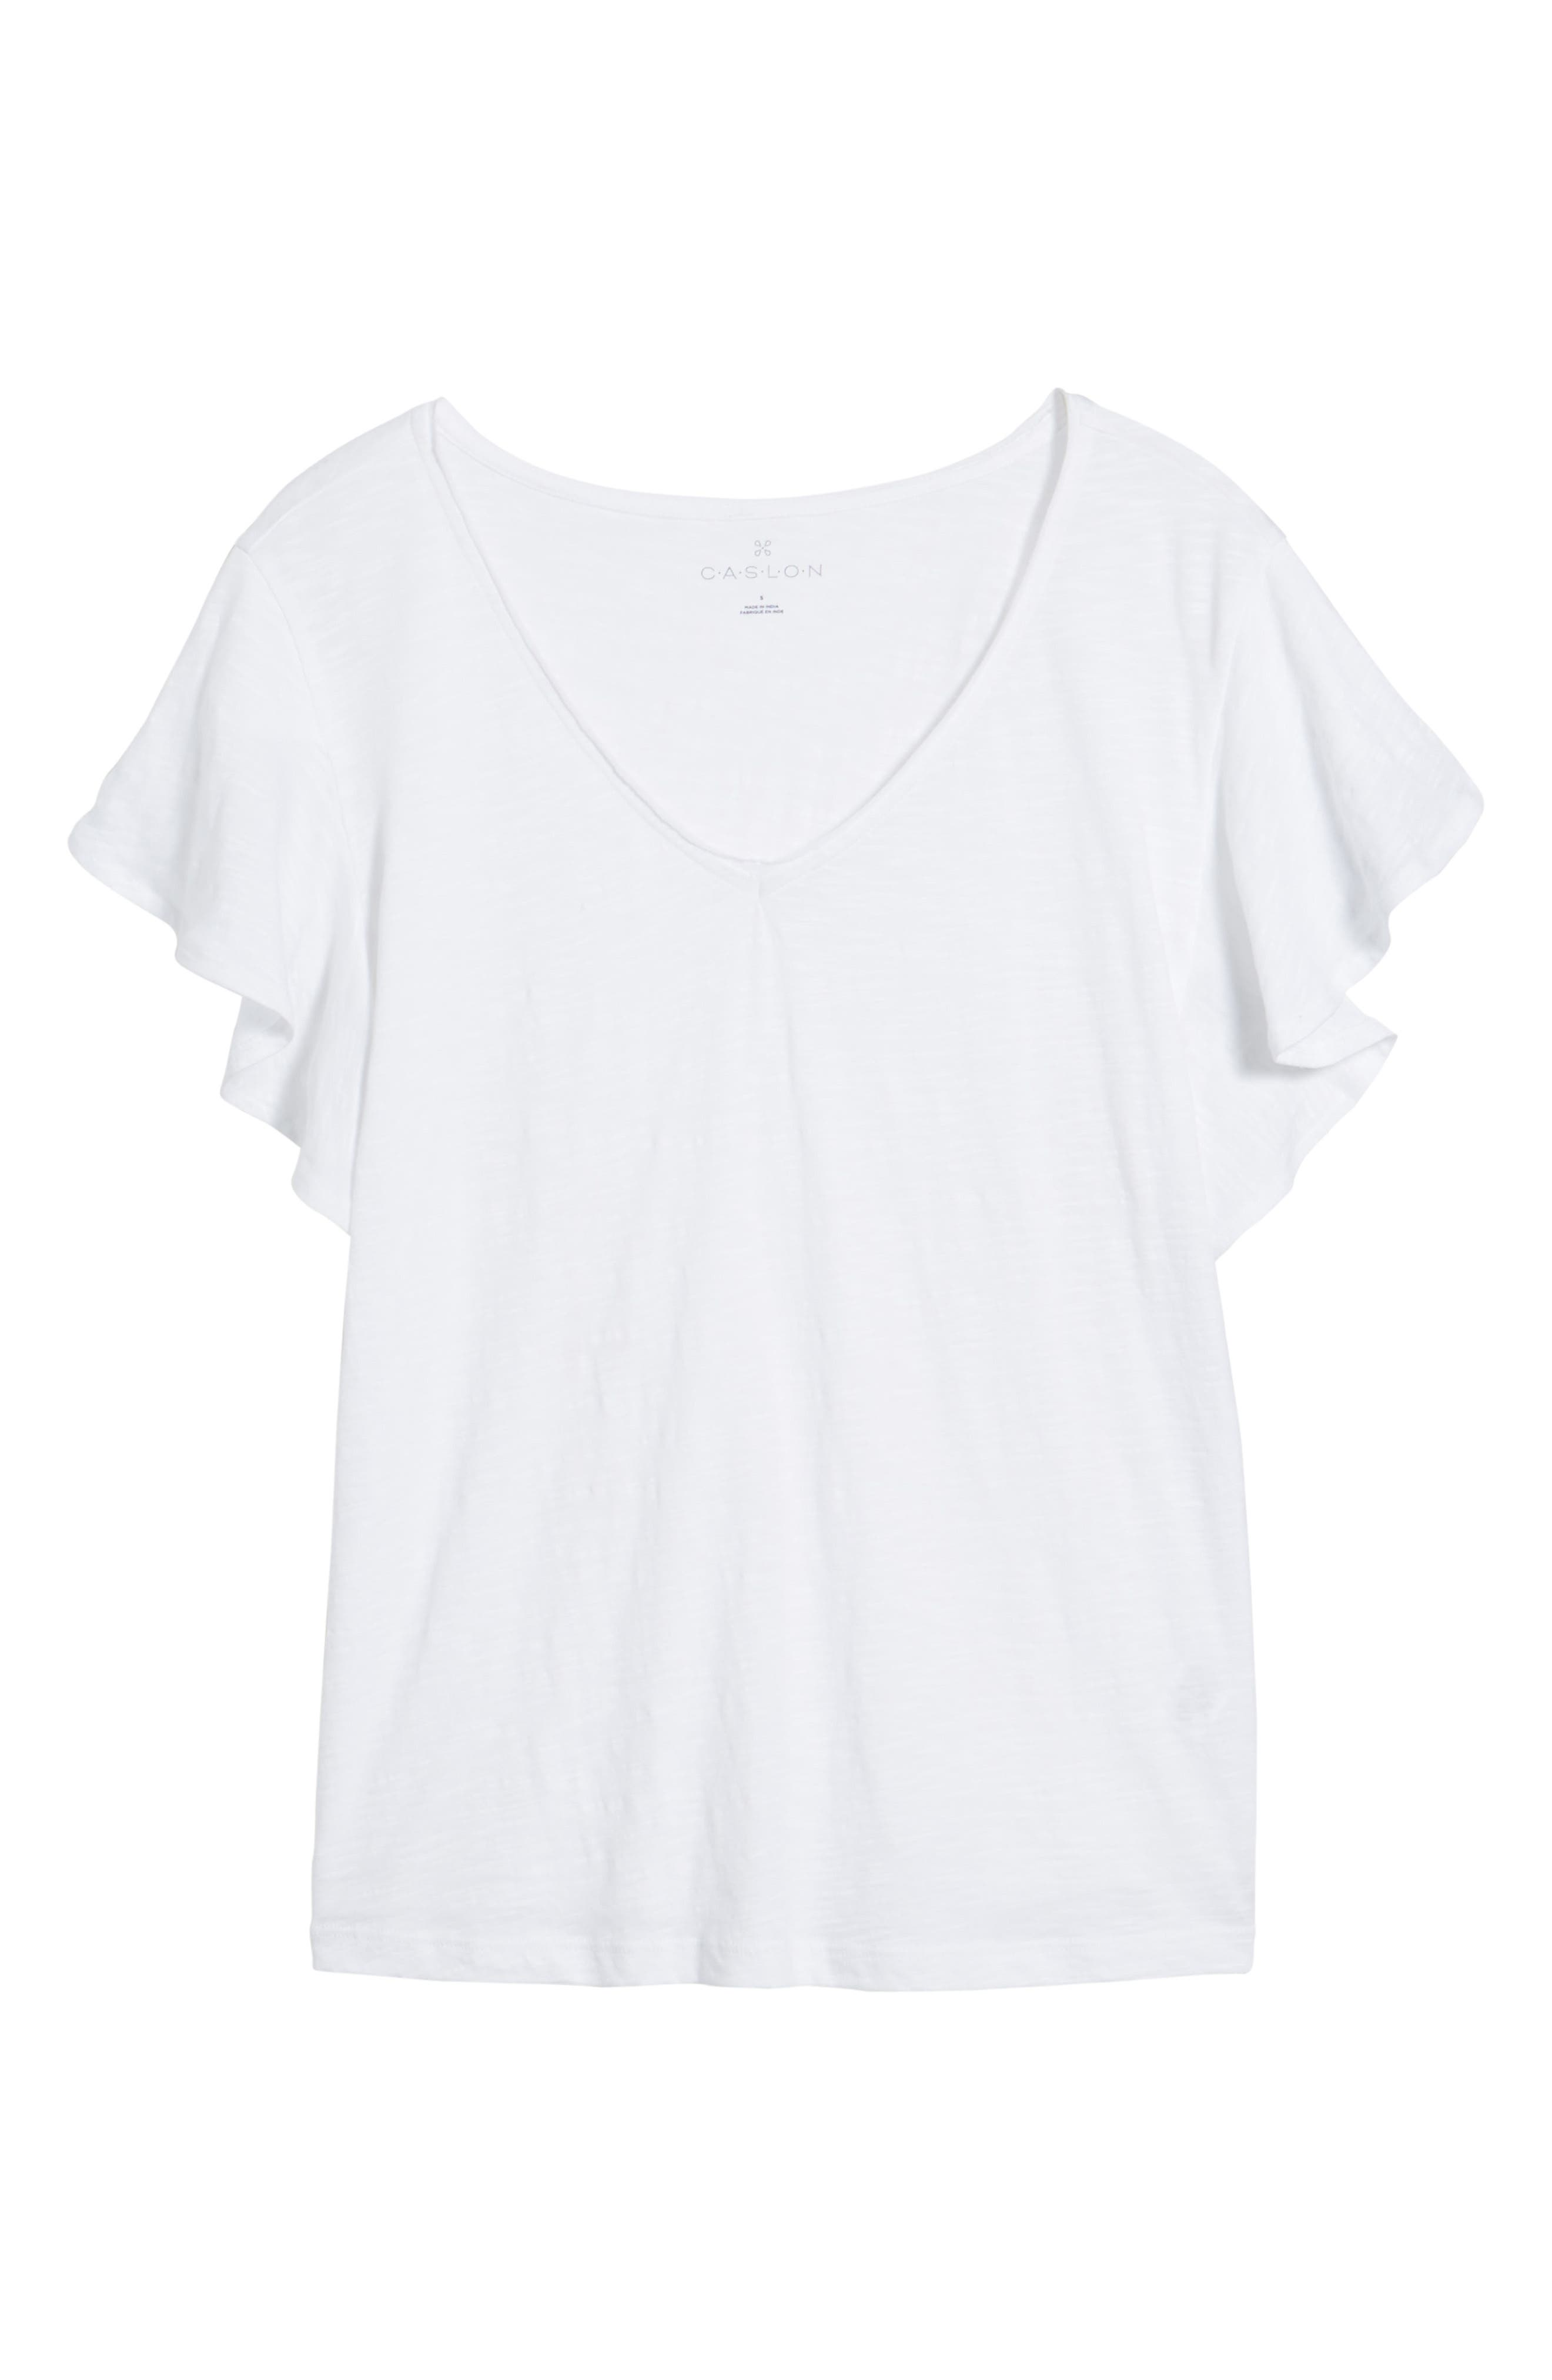 Flounce Short Sleeve Tee,                             Alternate thumbnail 6, color,                             White